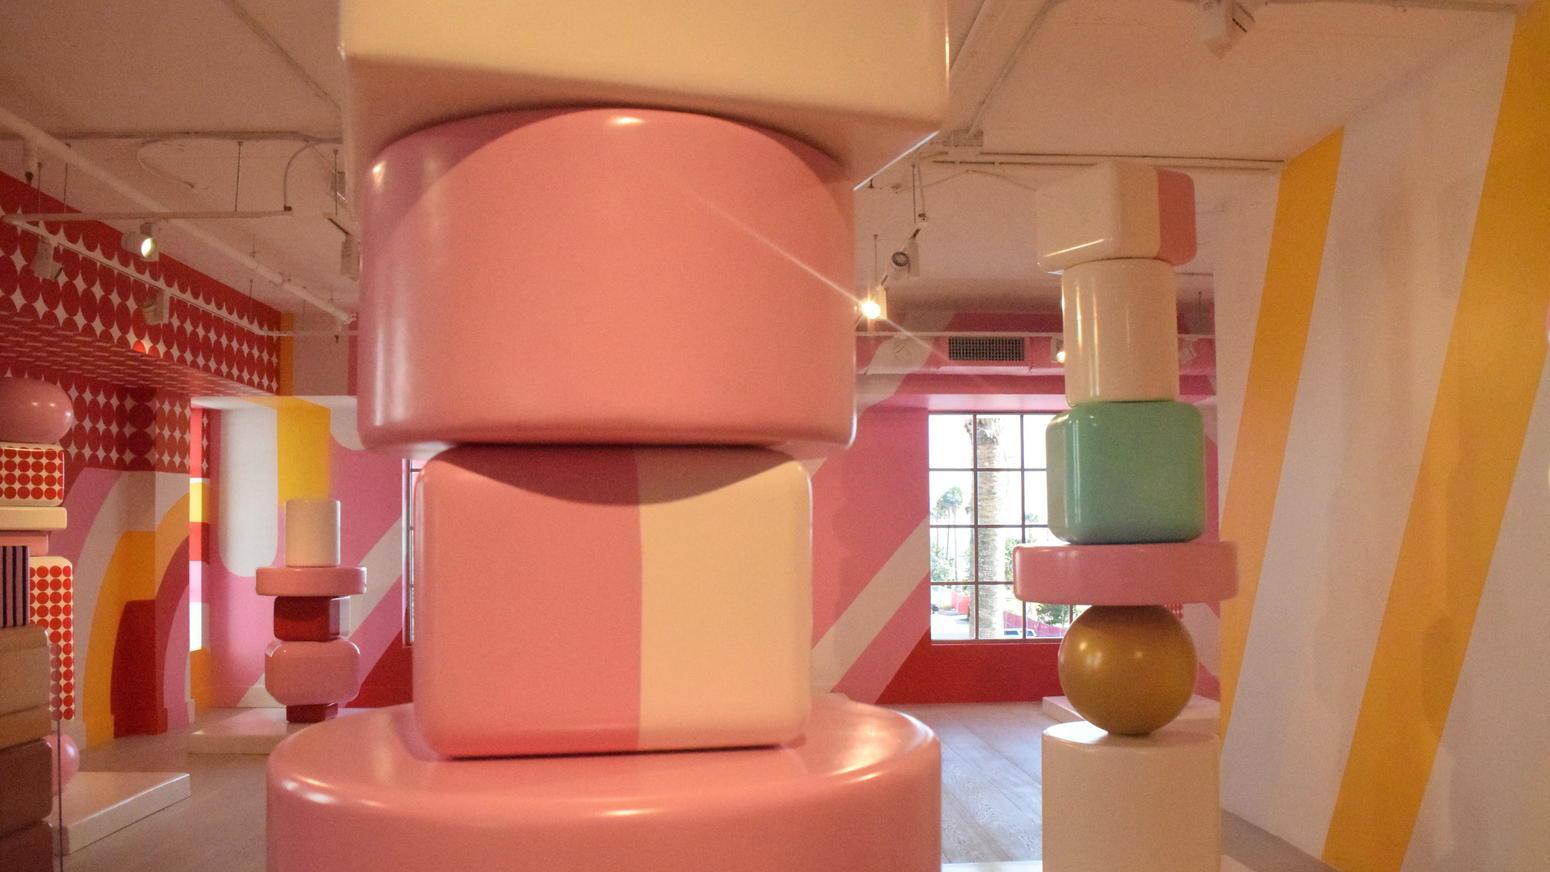 sfl-art-basel-2017-museum-ice-cream-photos-014